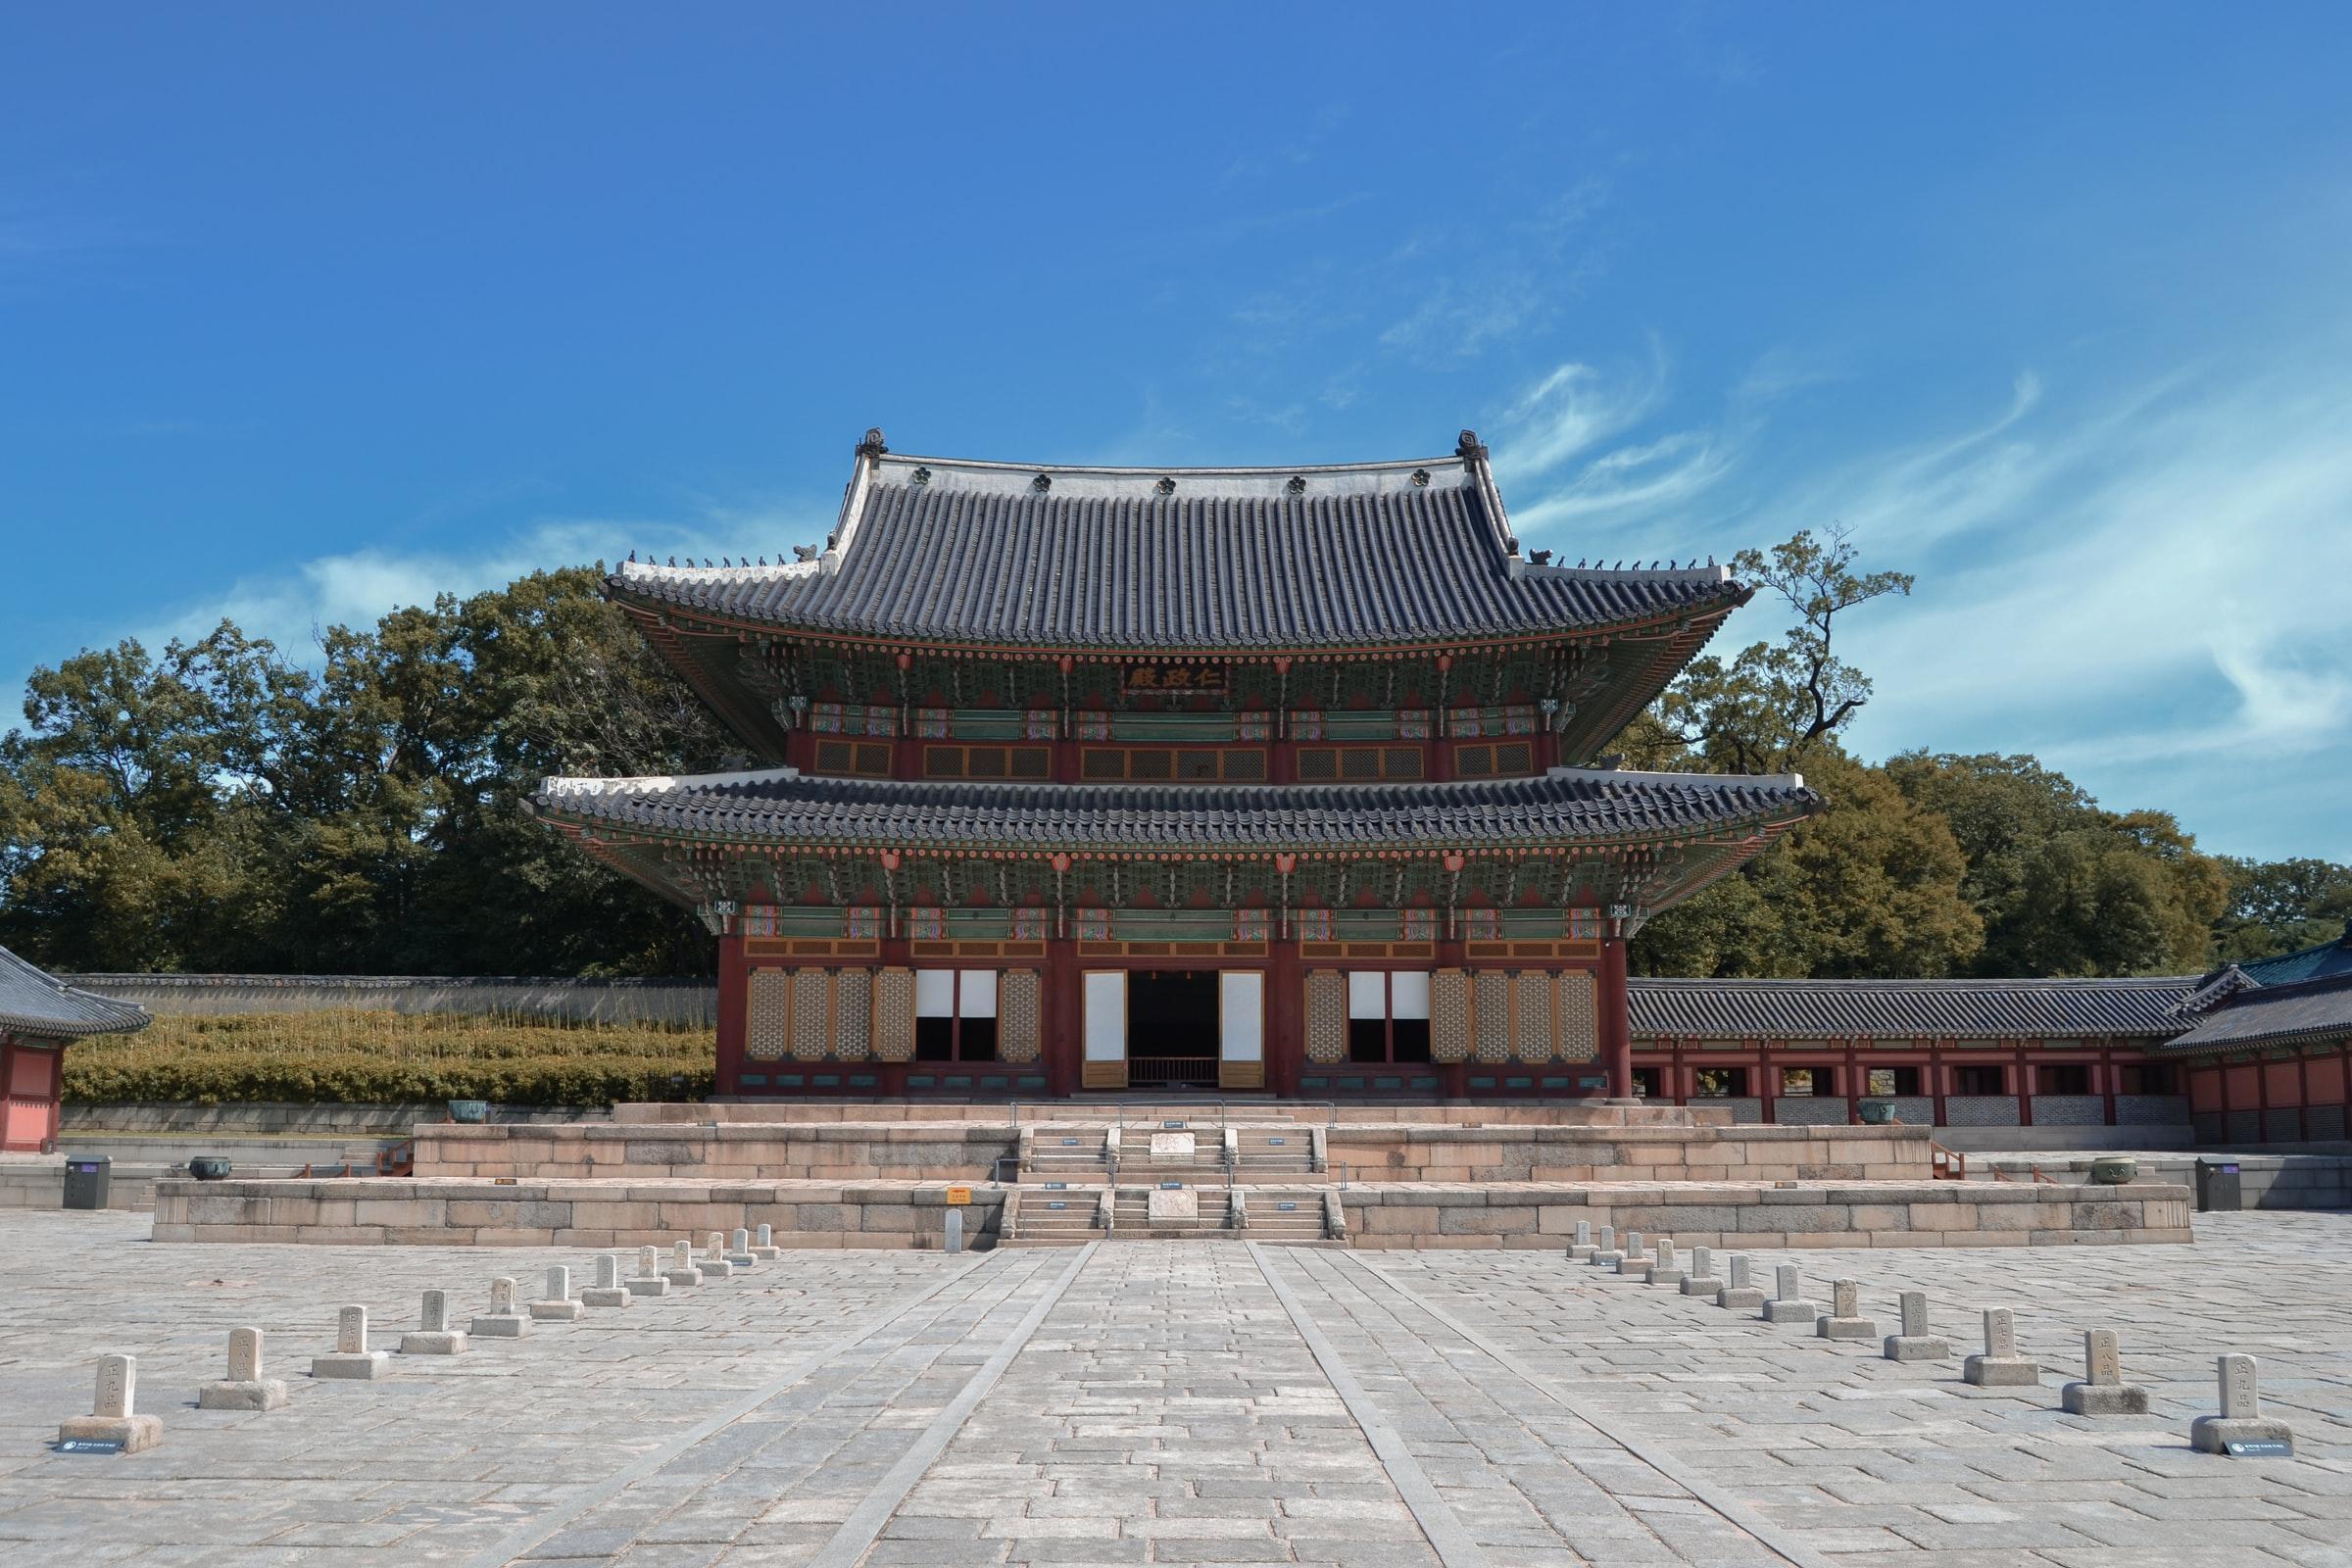 Seoul Changdeokgung